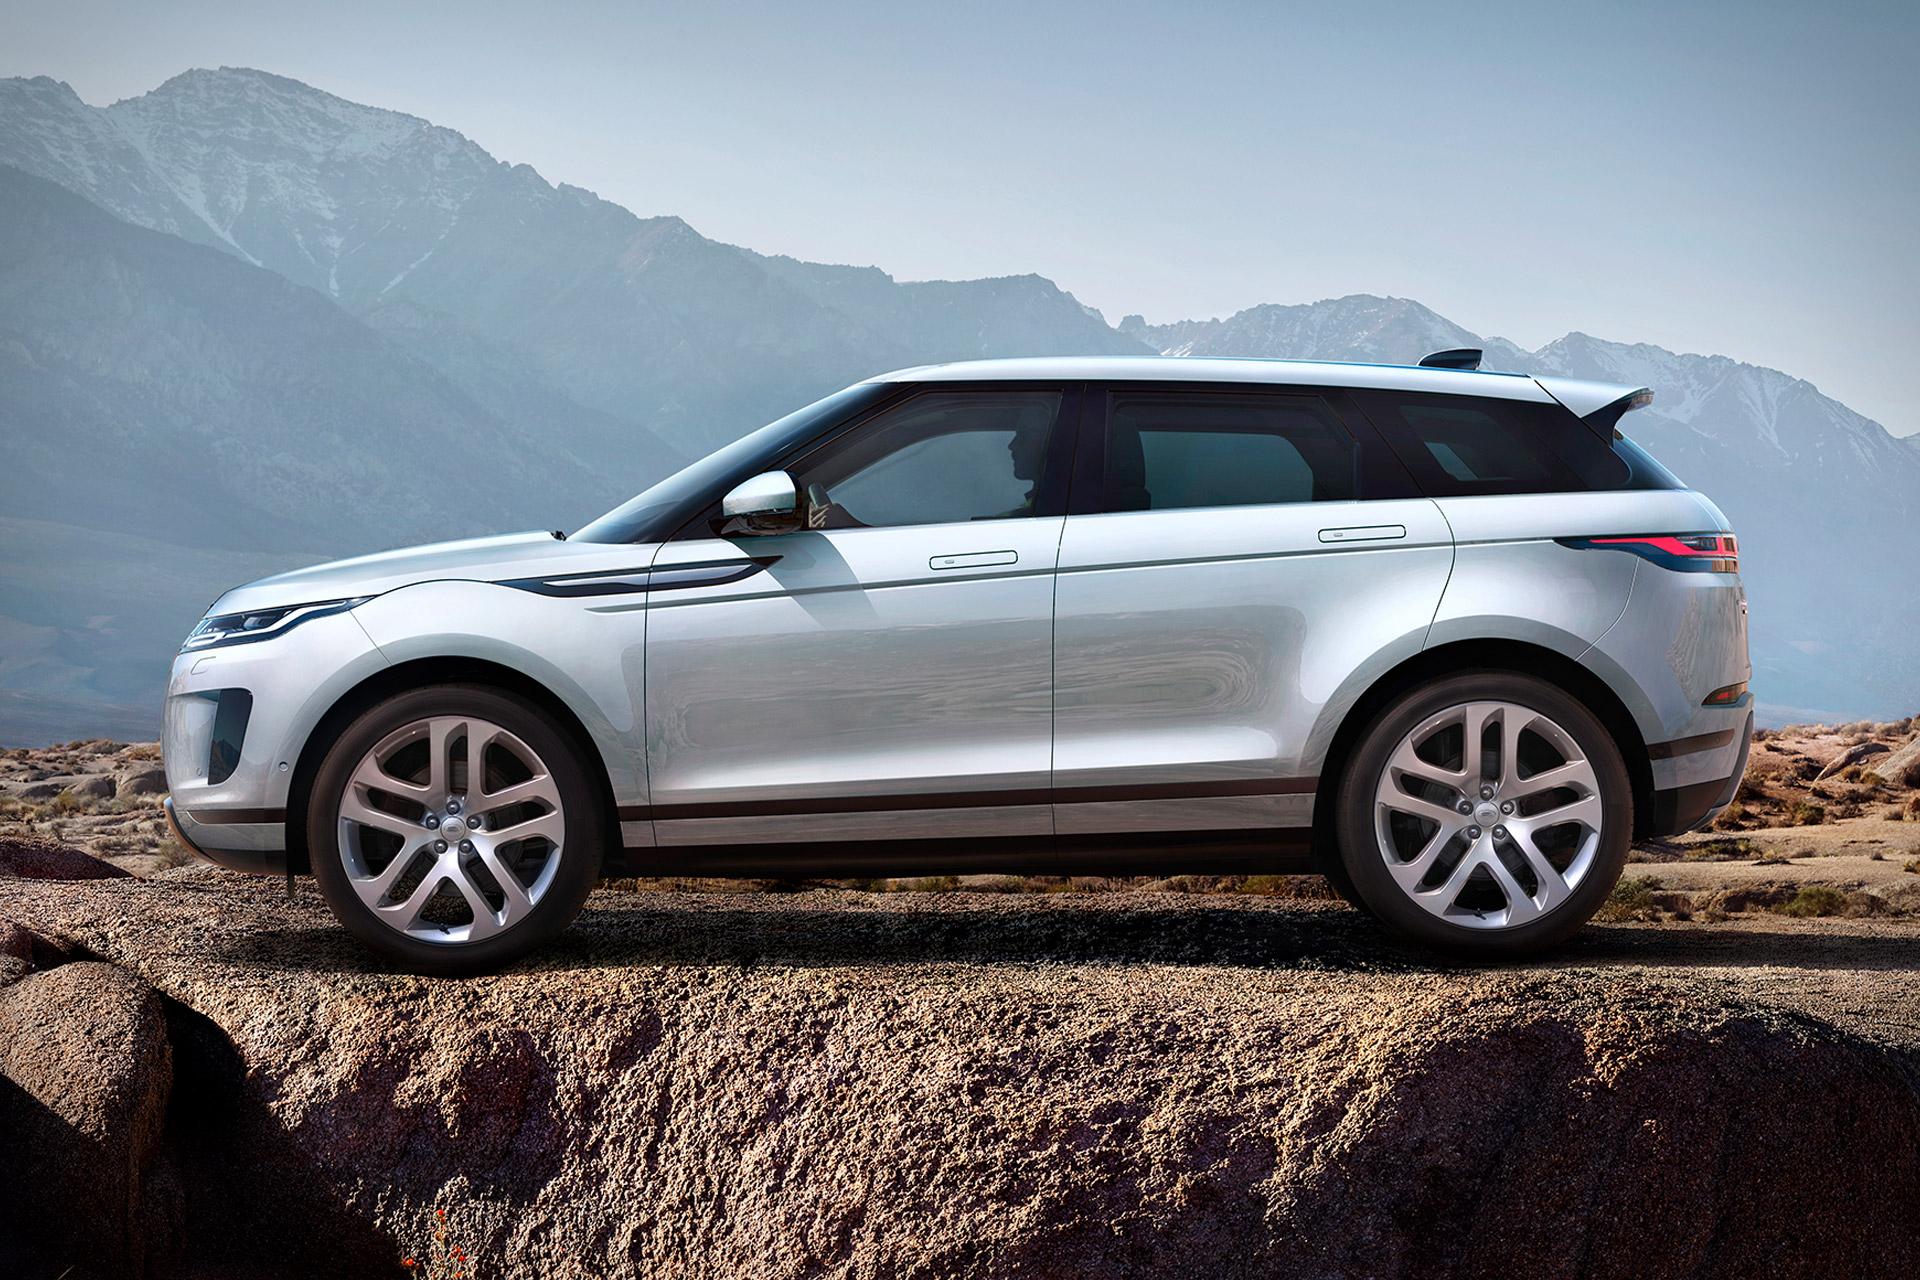 2020 Range Rover Evoque | Uncrate